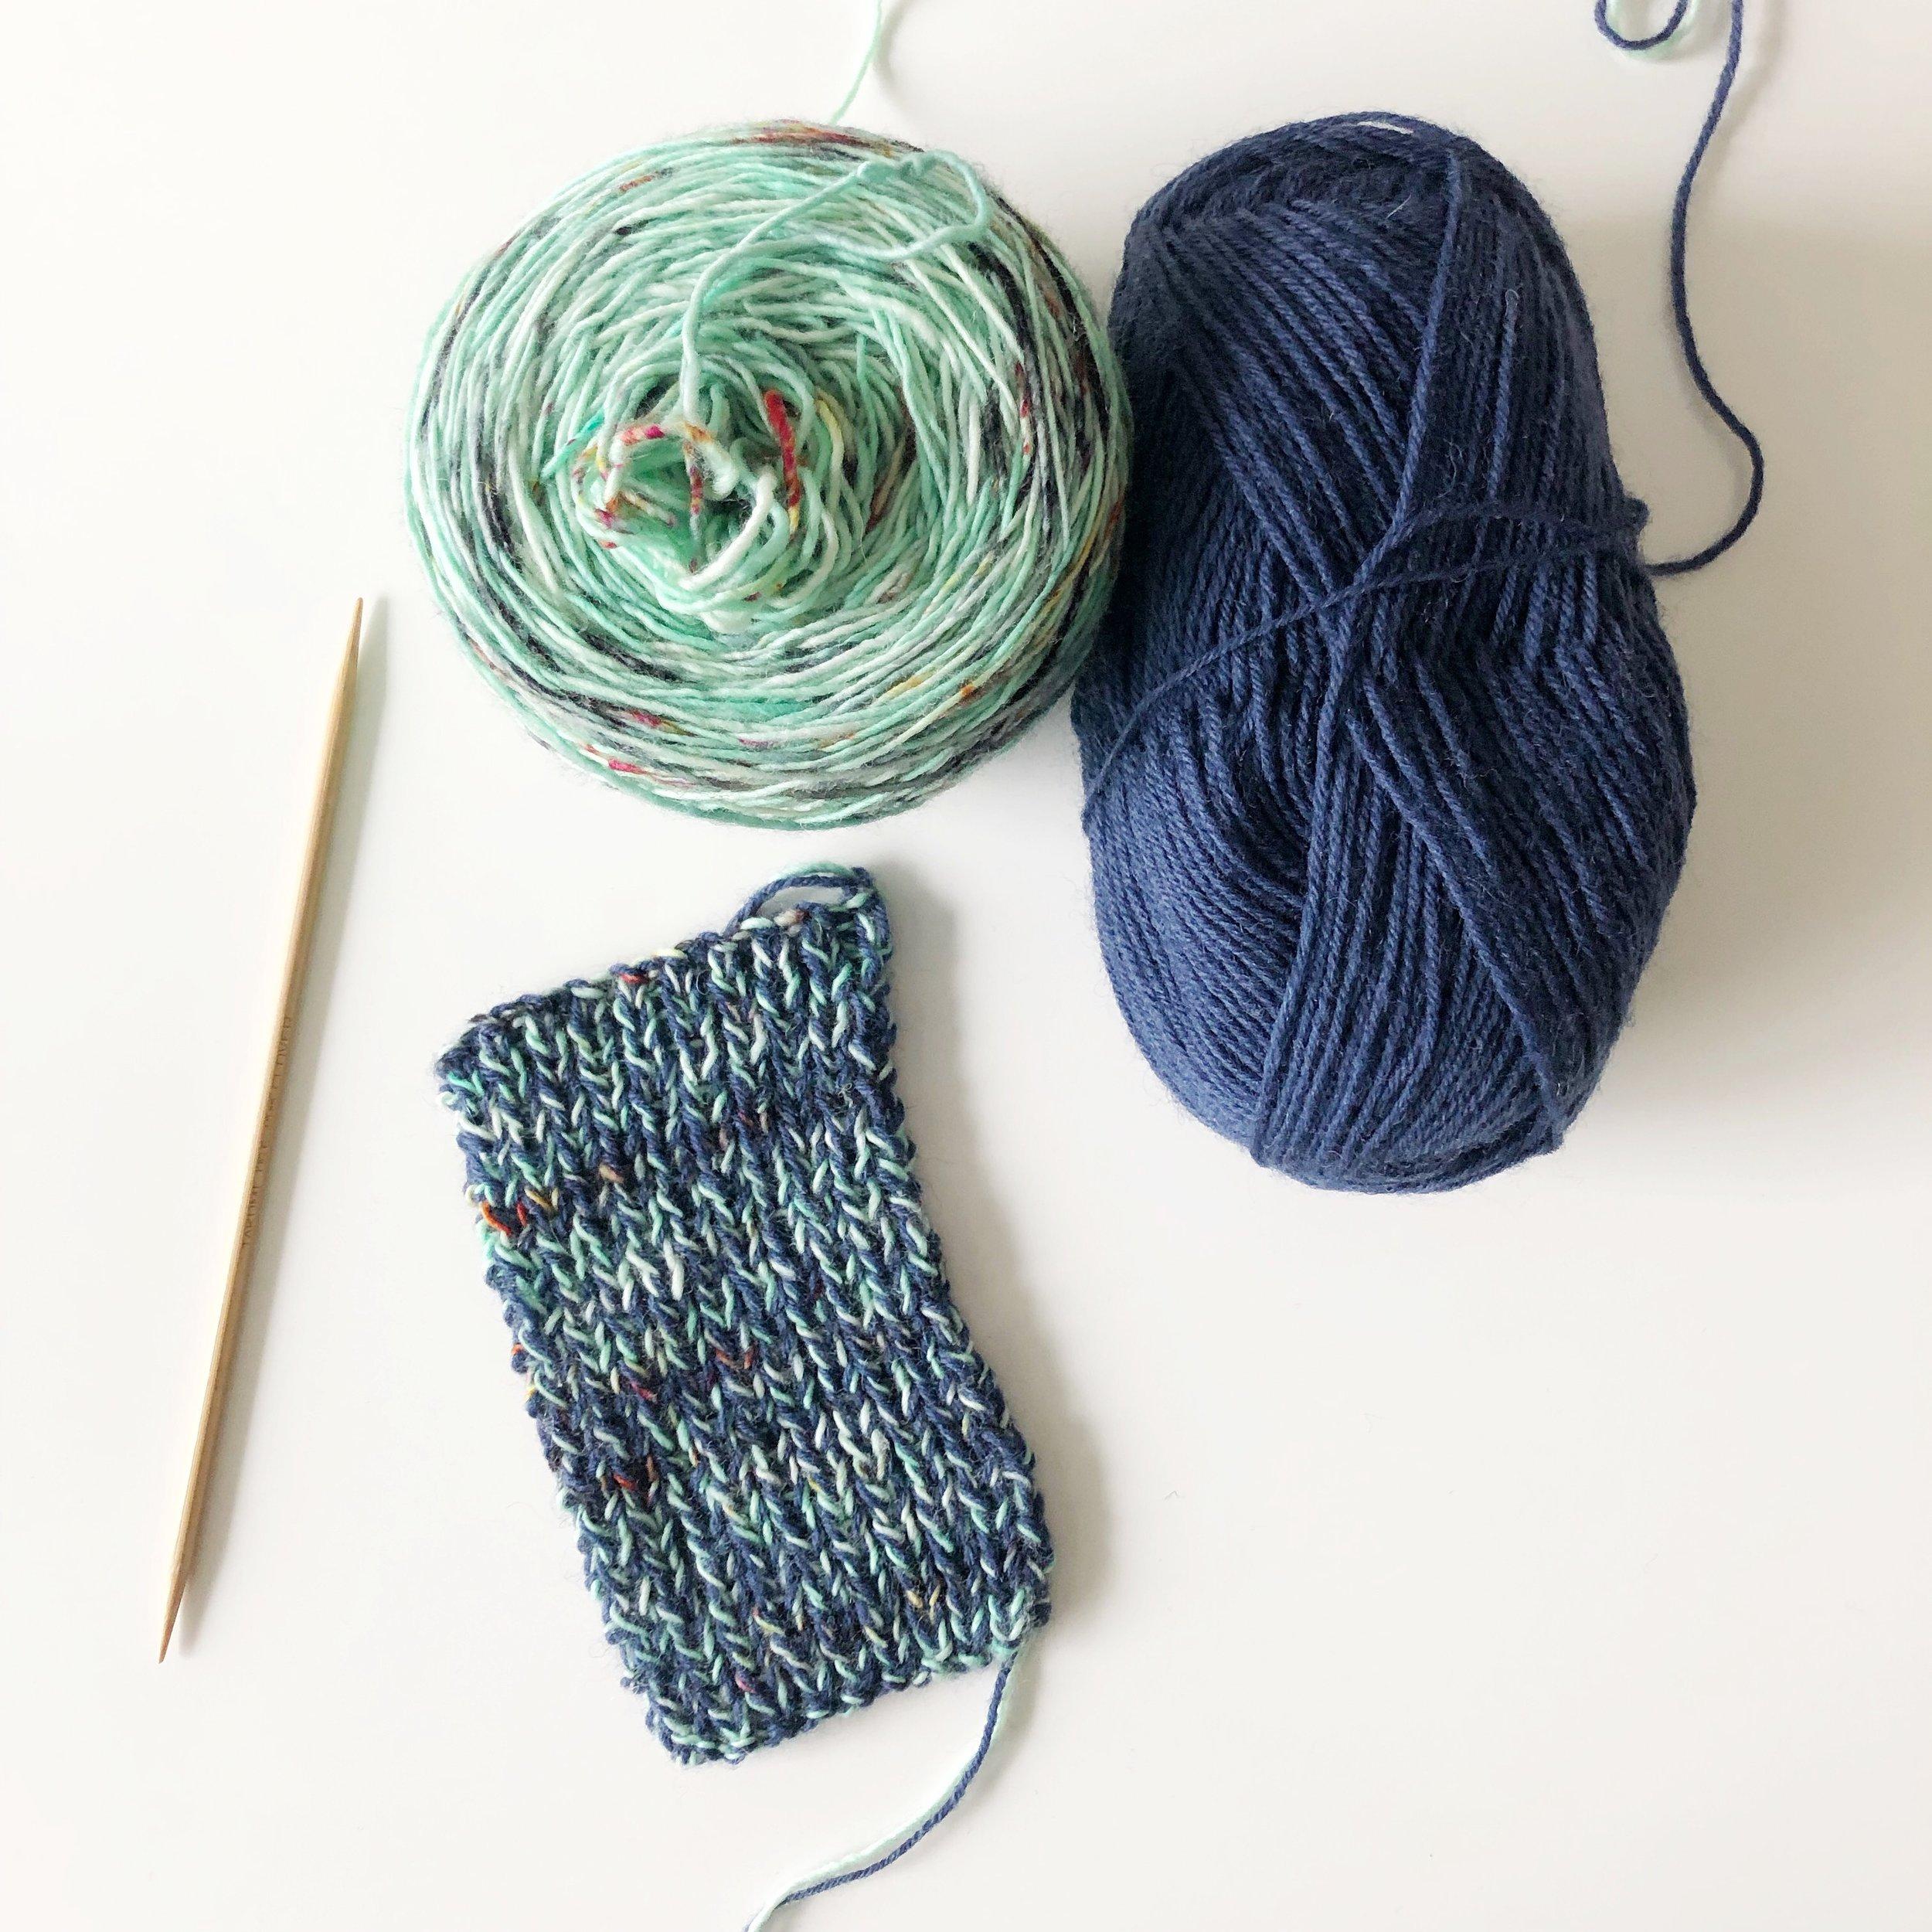 elisemade-knitdiaries-test-knit-swatch.JPG